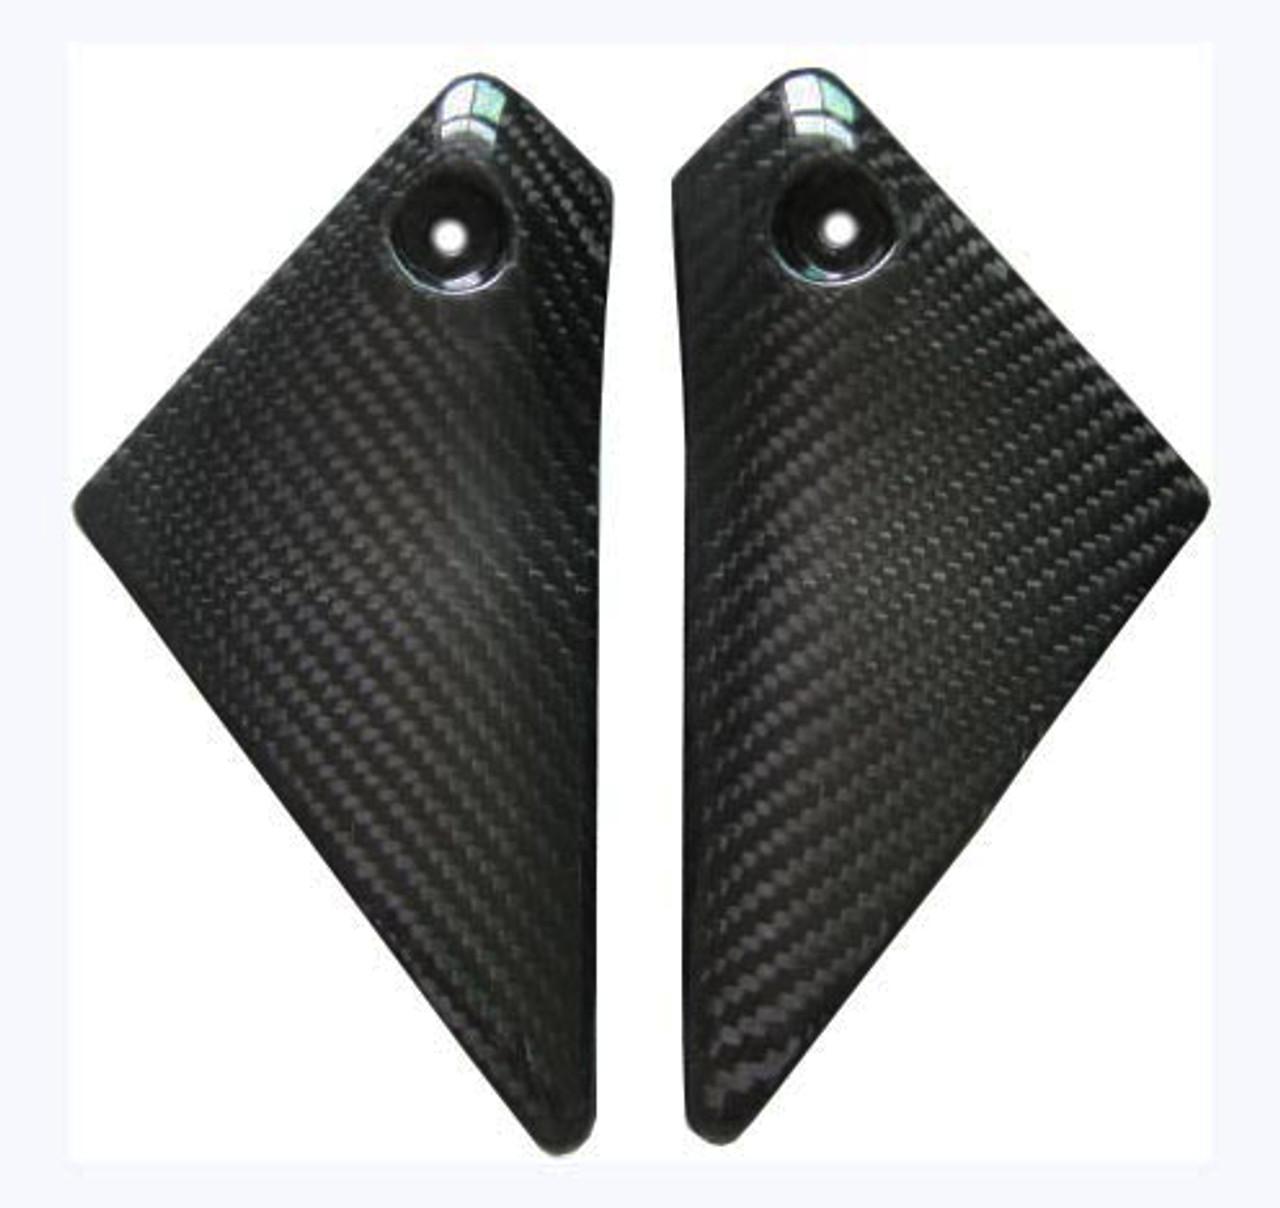 Glossy Twill Weave Carbon Fiber Upper Side Panels for Yamaha FZ1 06 - 09 (Naked Bike)